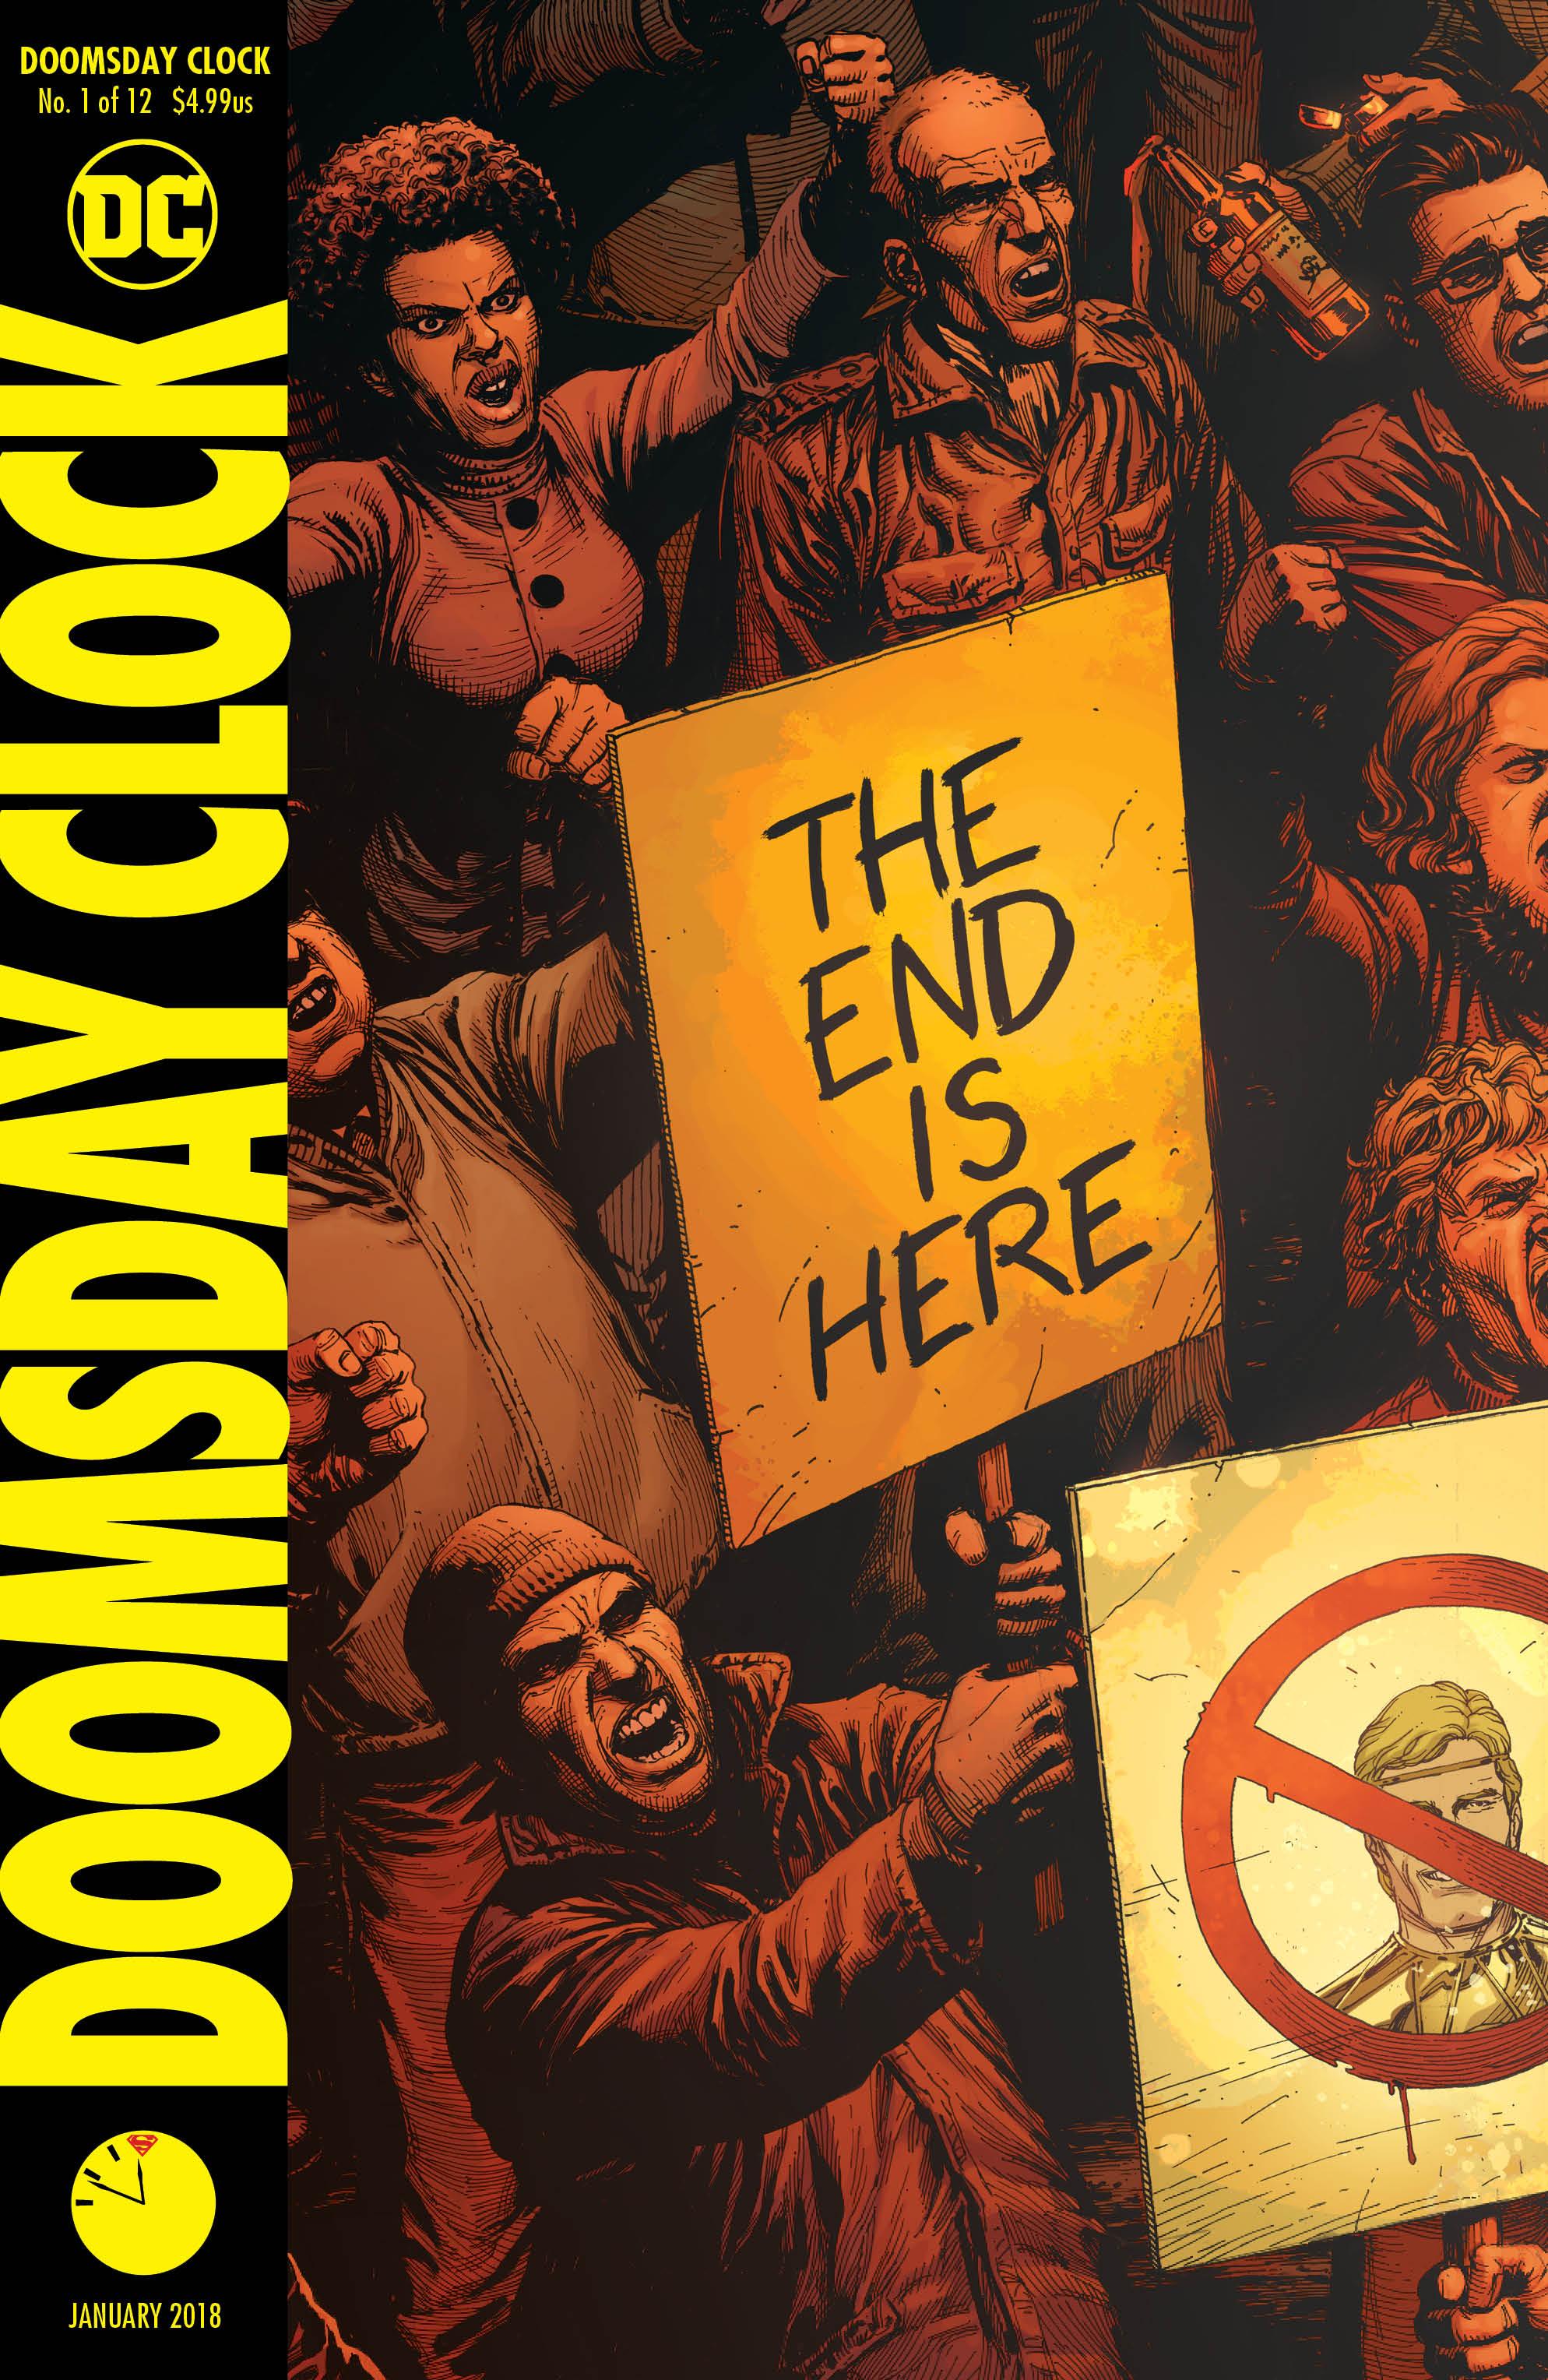 doomsday clock issue 12